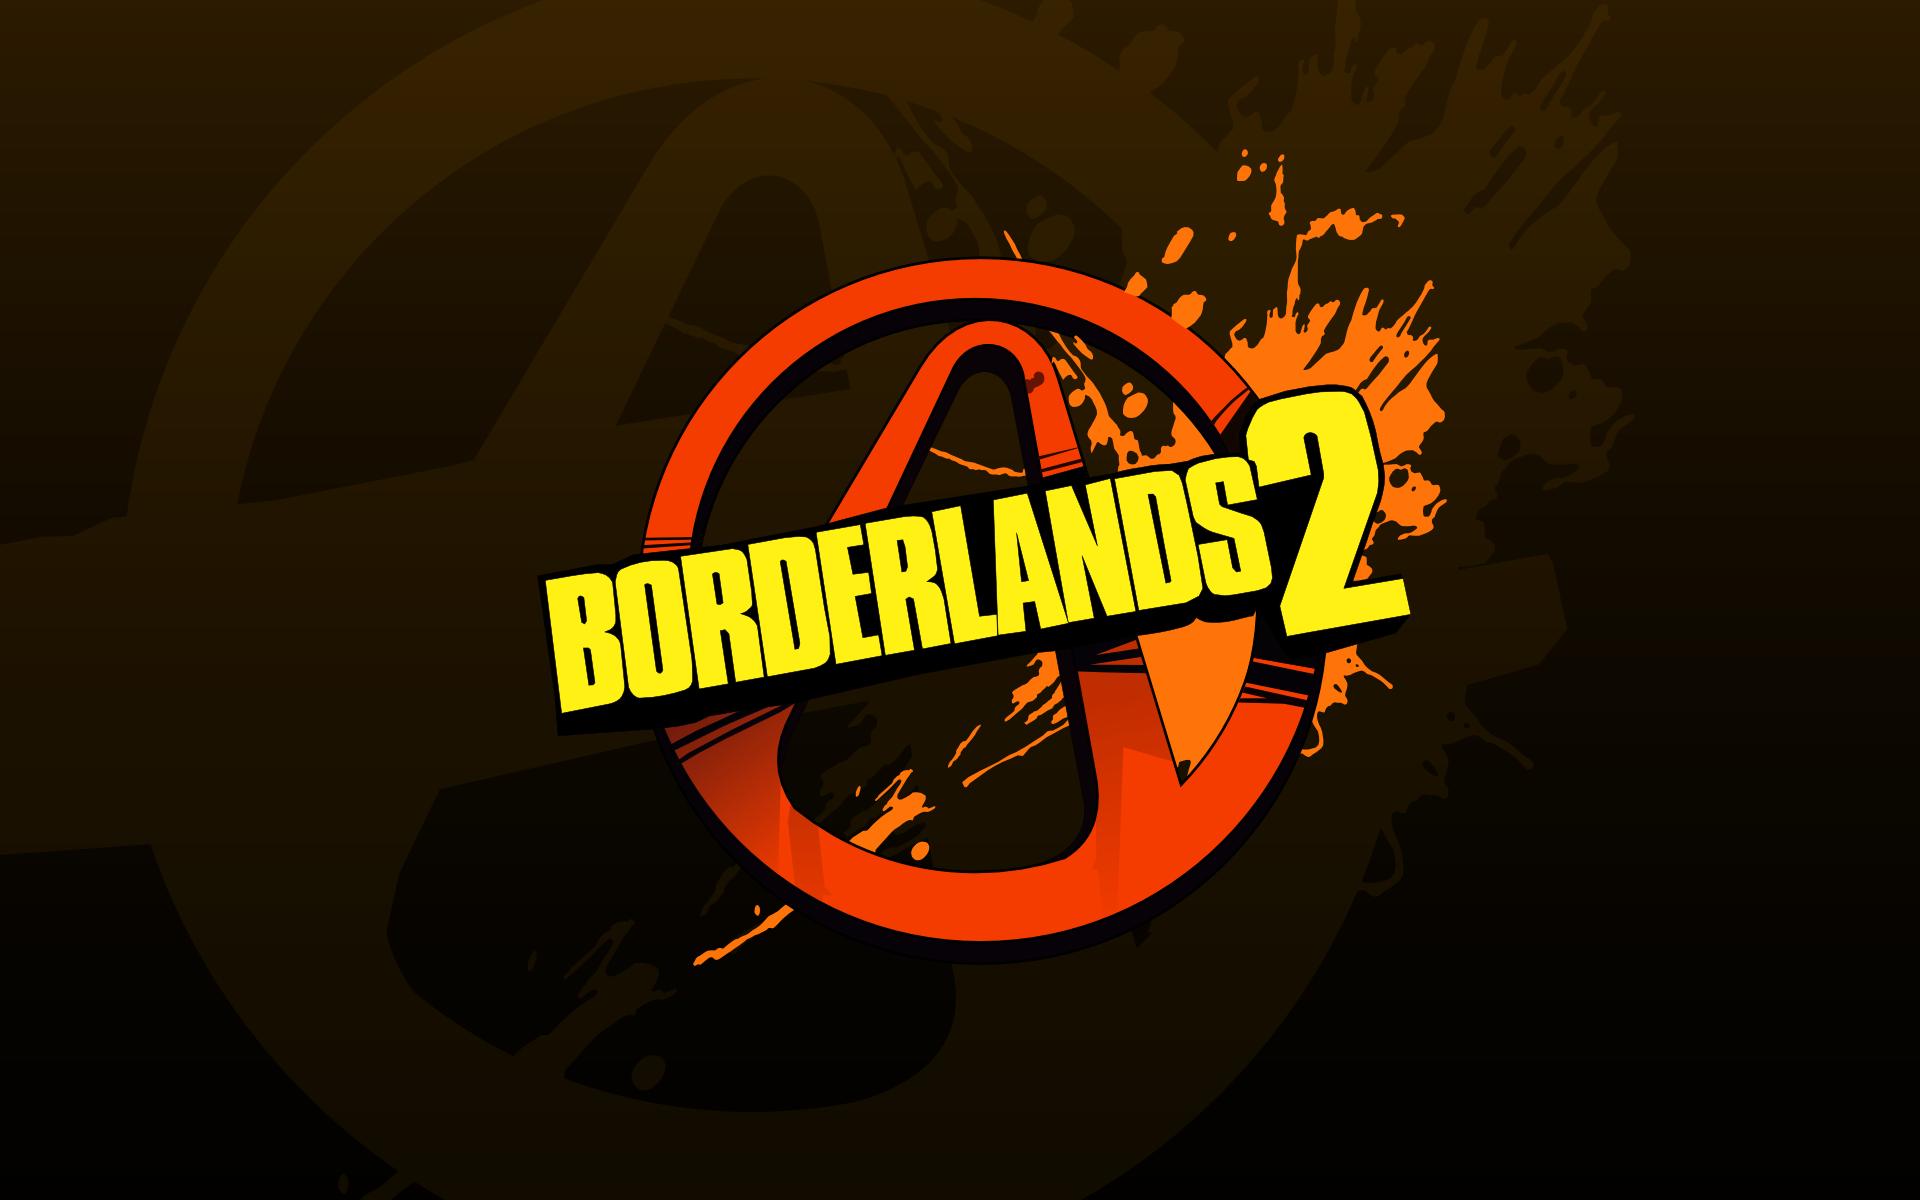 Borderlands 2 Wallpaper